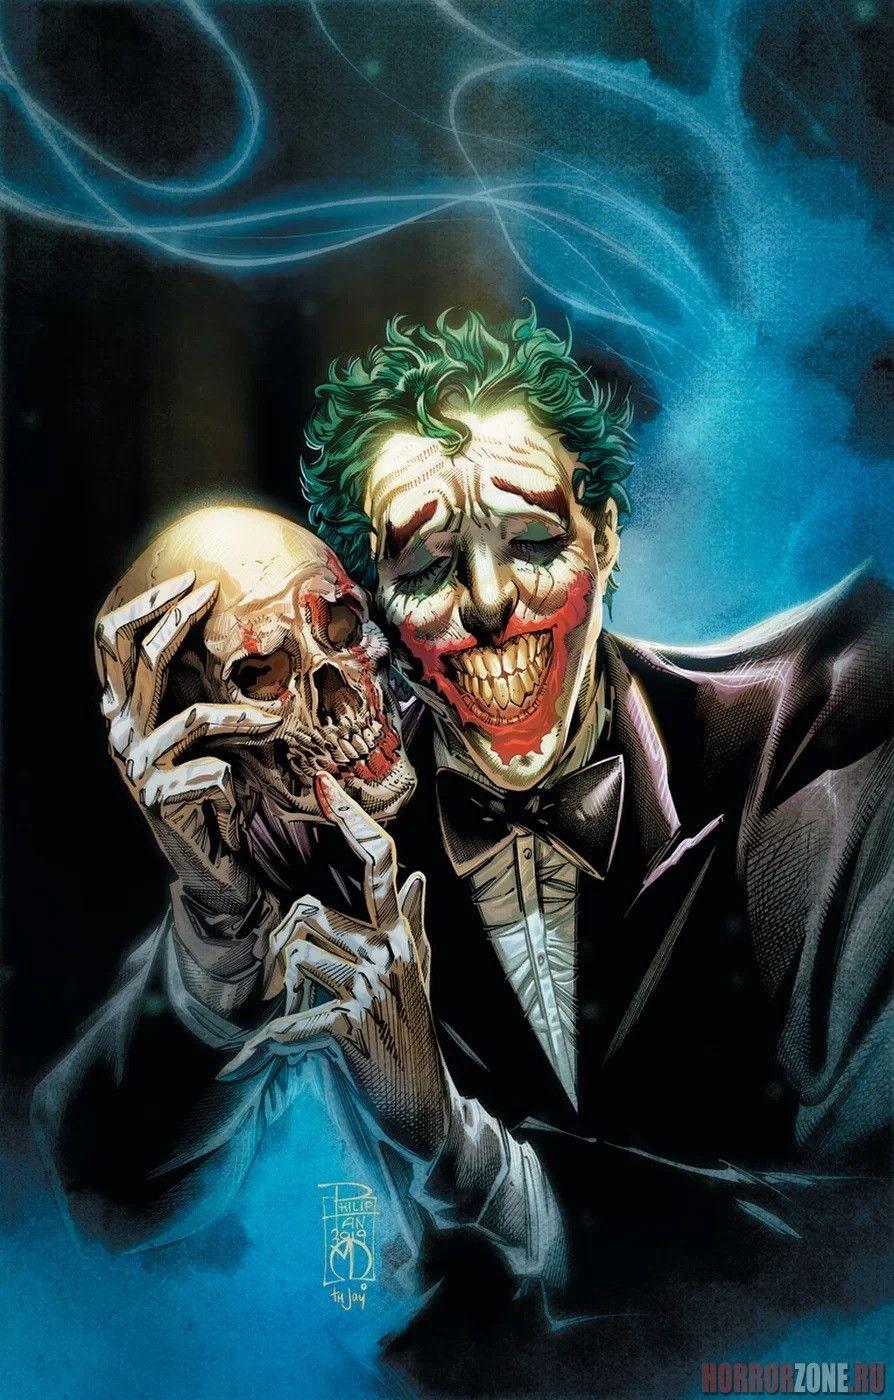 Джон Карпентер сочинил комикс про Джокера | Джокер ...